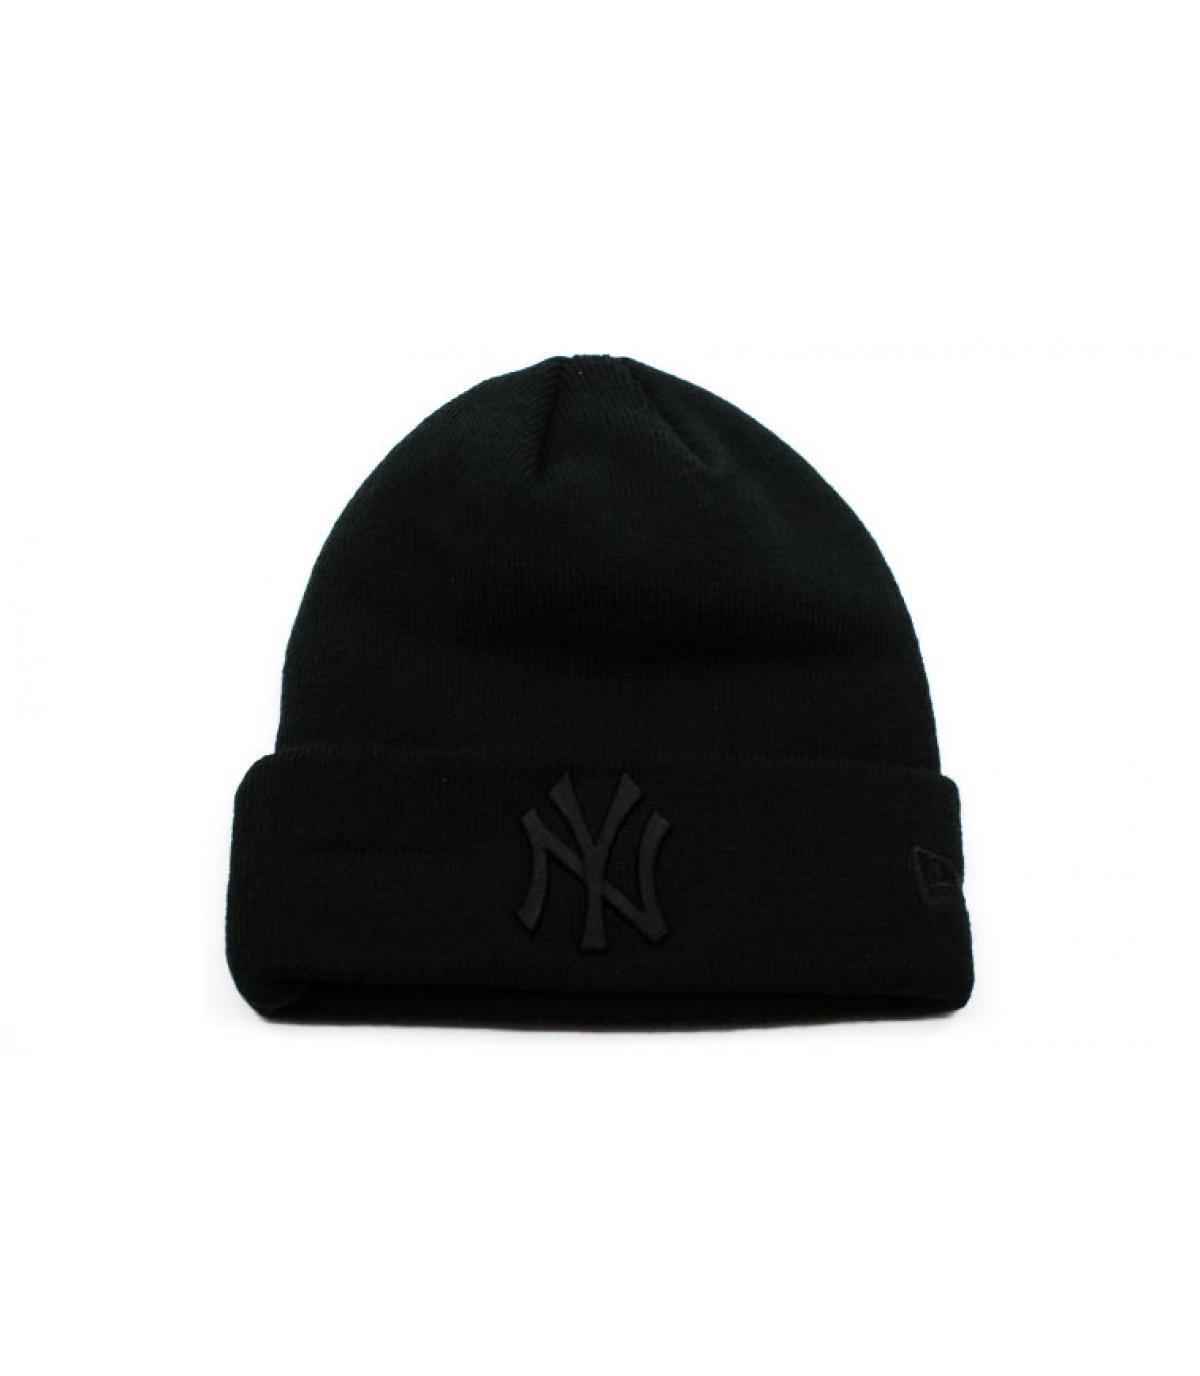 Details Mütze MLB Essential Cuff NY black - Abbildung 2